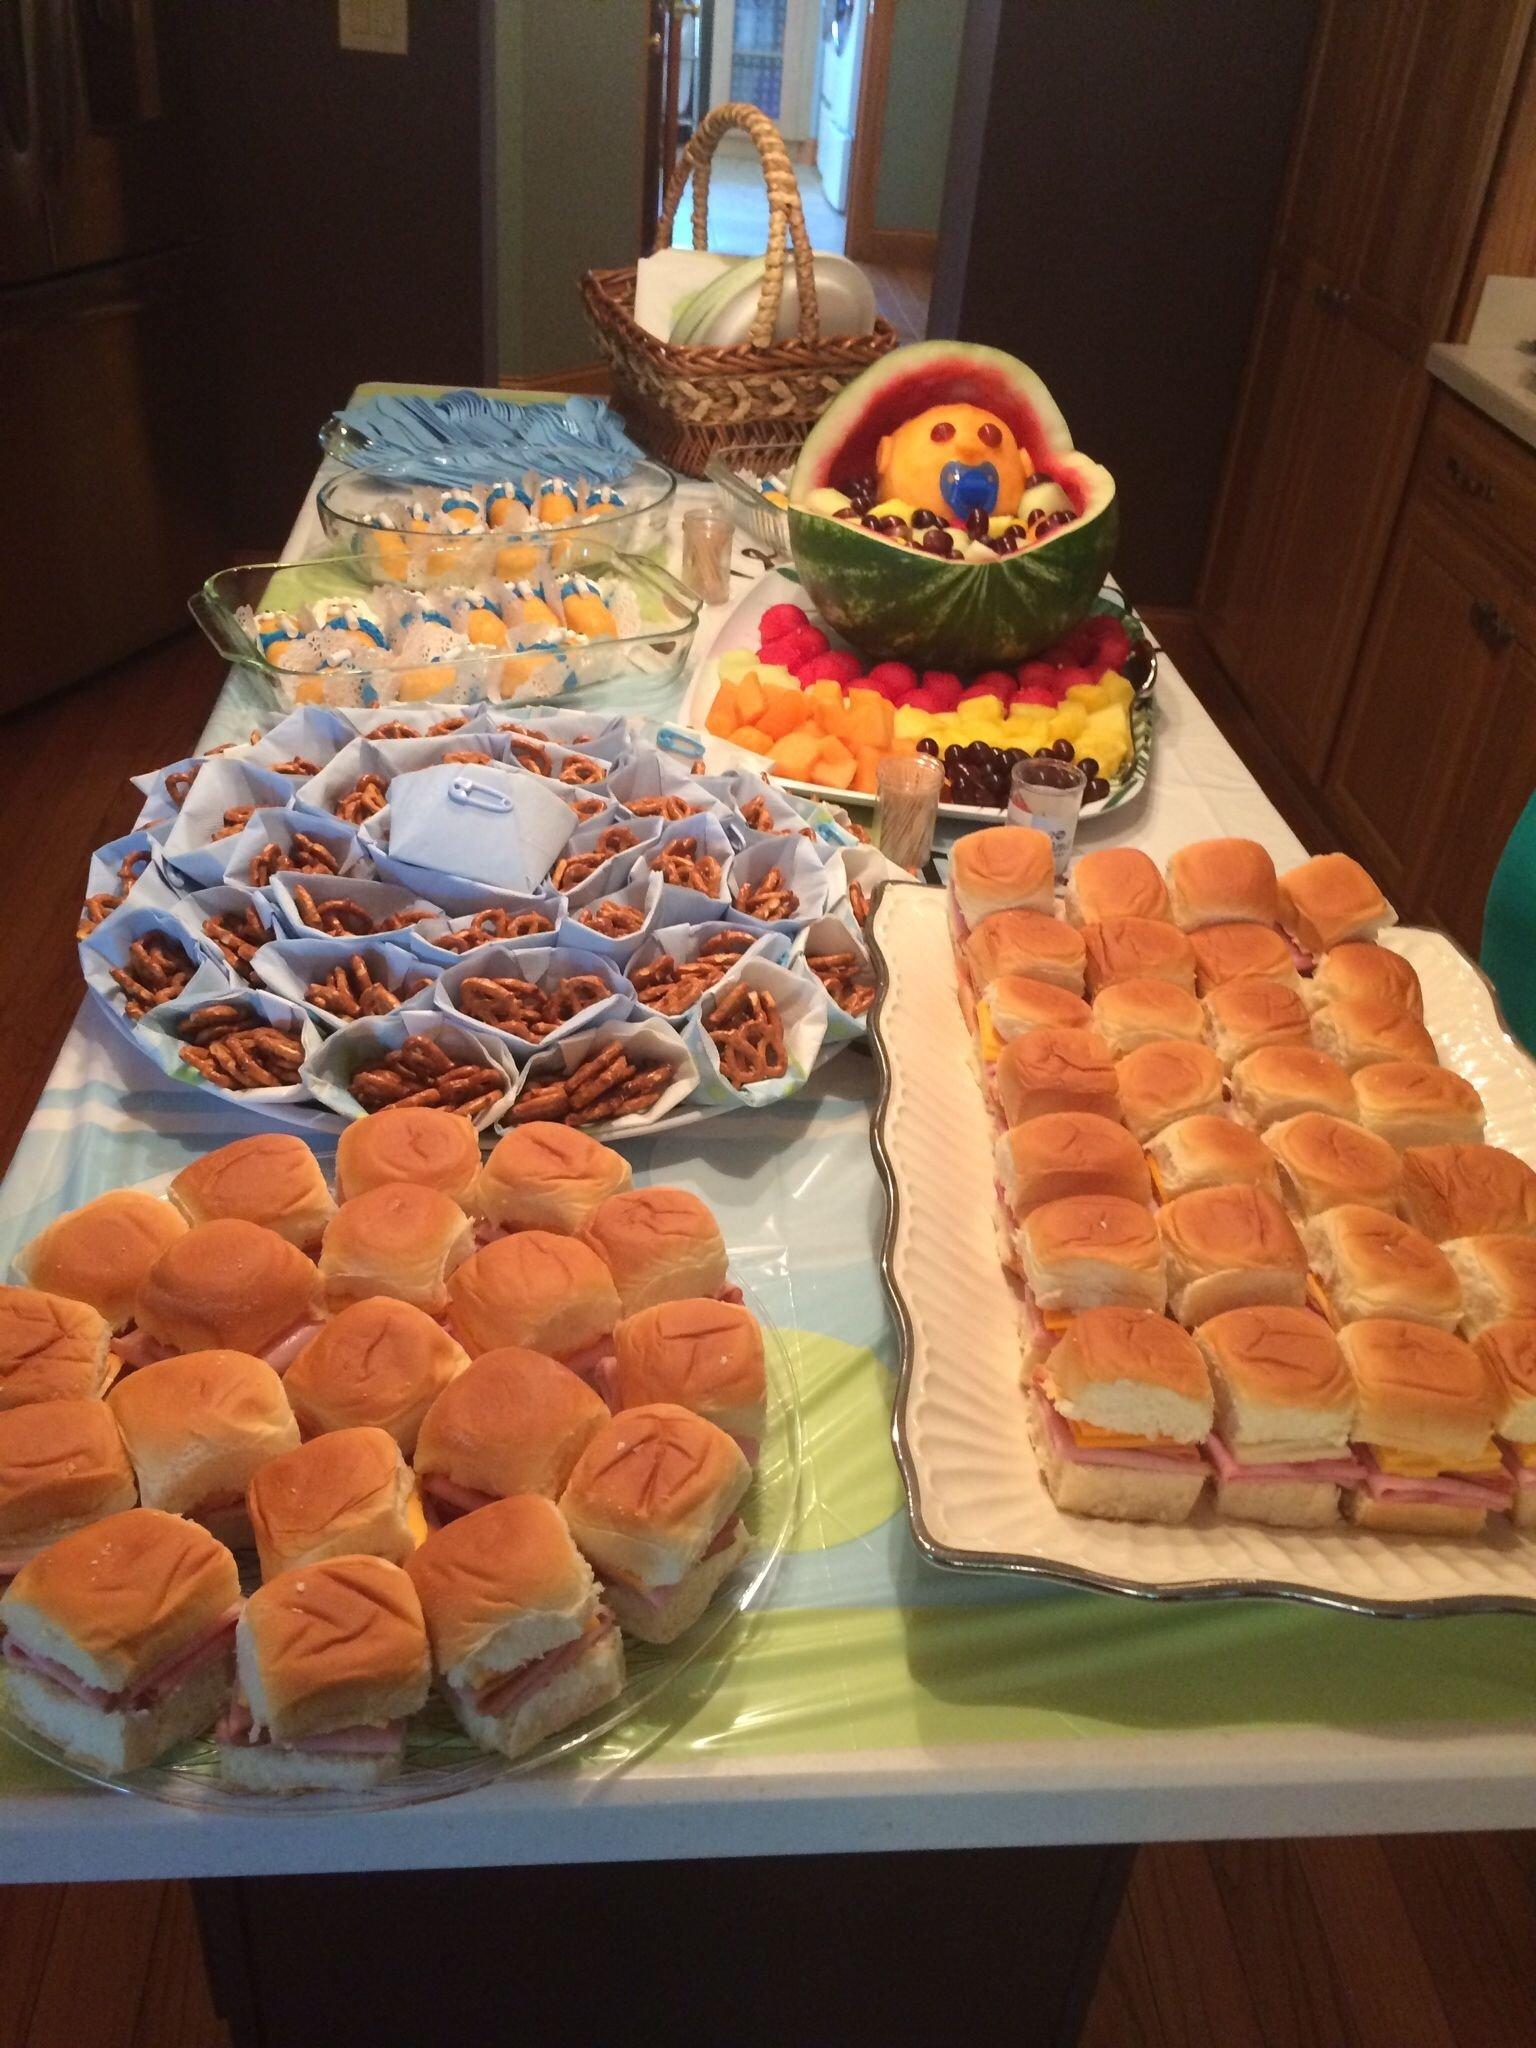 baby shower food on a budget. sandwiches on hawaiian rolls, pretzel